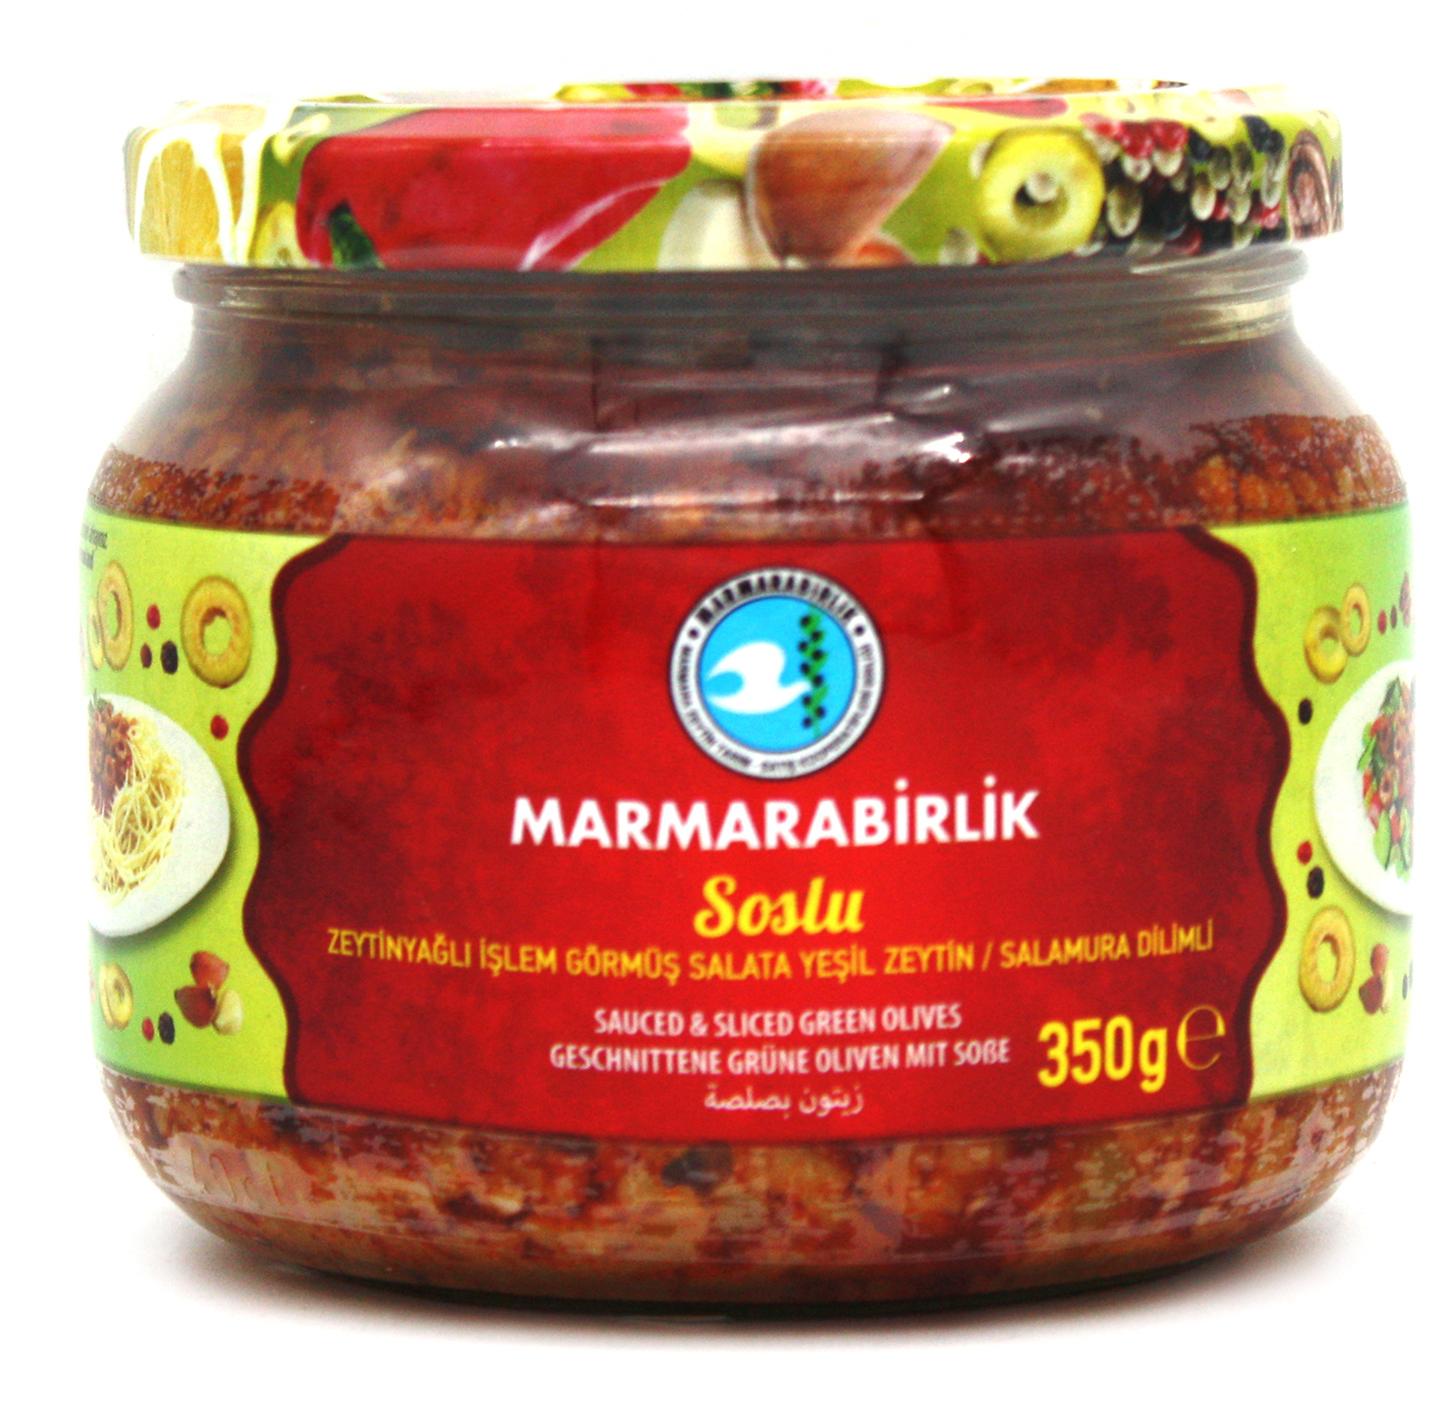 Marmarabirlik Соус из зеленых оливок со специями, Marmarabirlik, 350 г import_files_6c_6c5de6f6f4d111e9a9ba484d7ecee297_c102ea3af97d11e9a9ba484d7ecee297.jpg